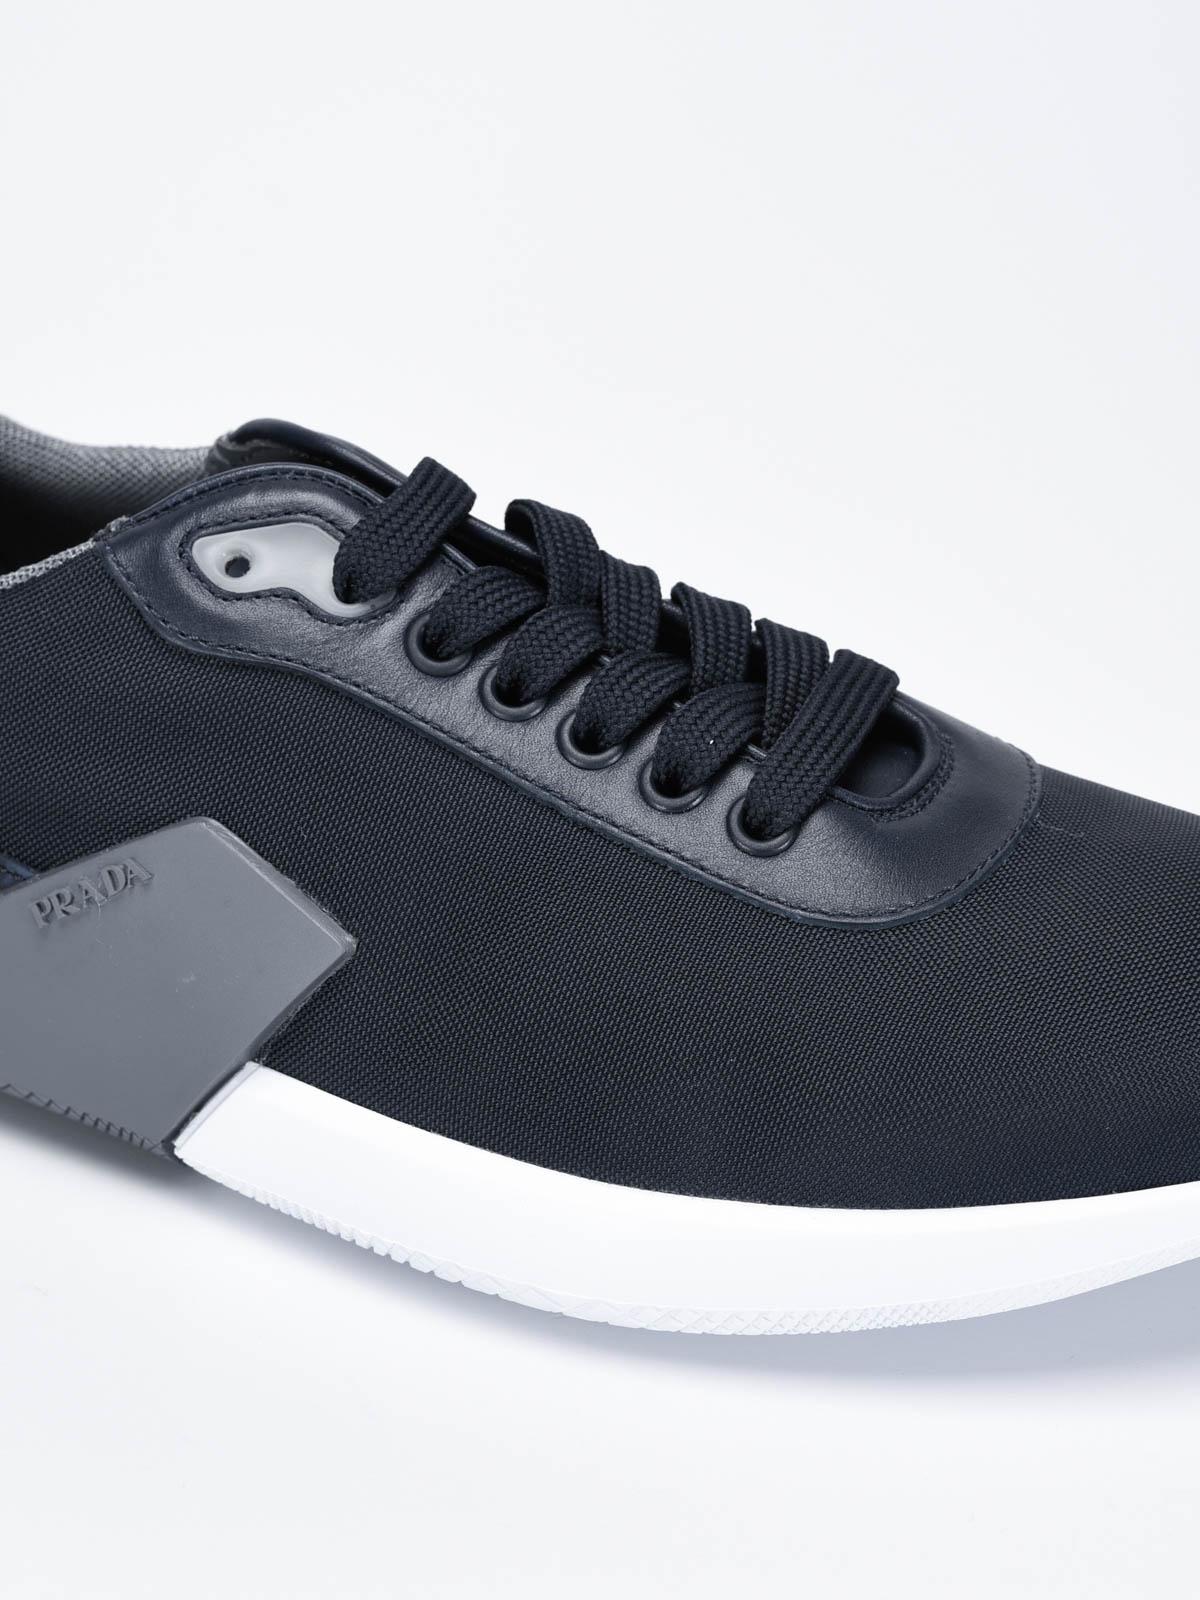 Prada - Nylon tech sneakers - trainers